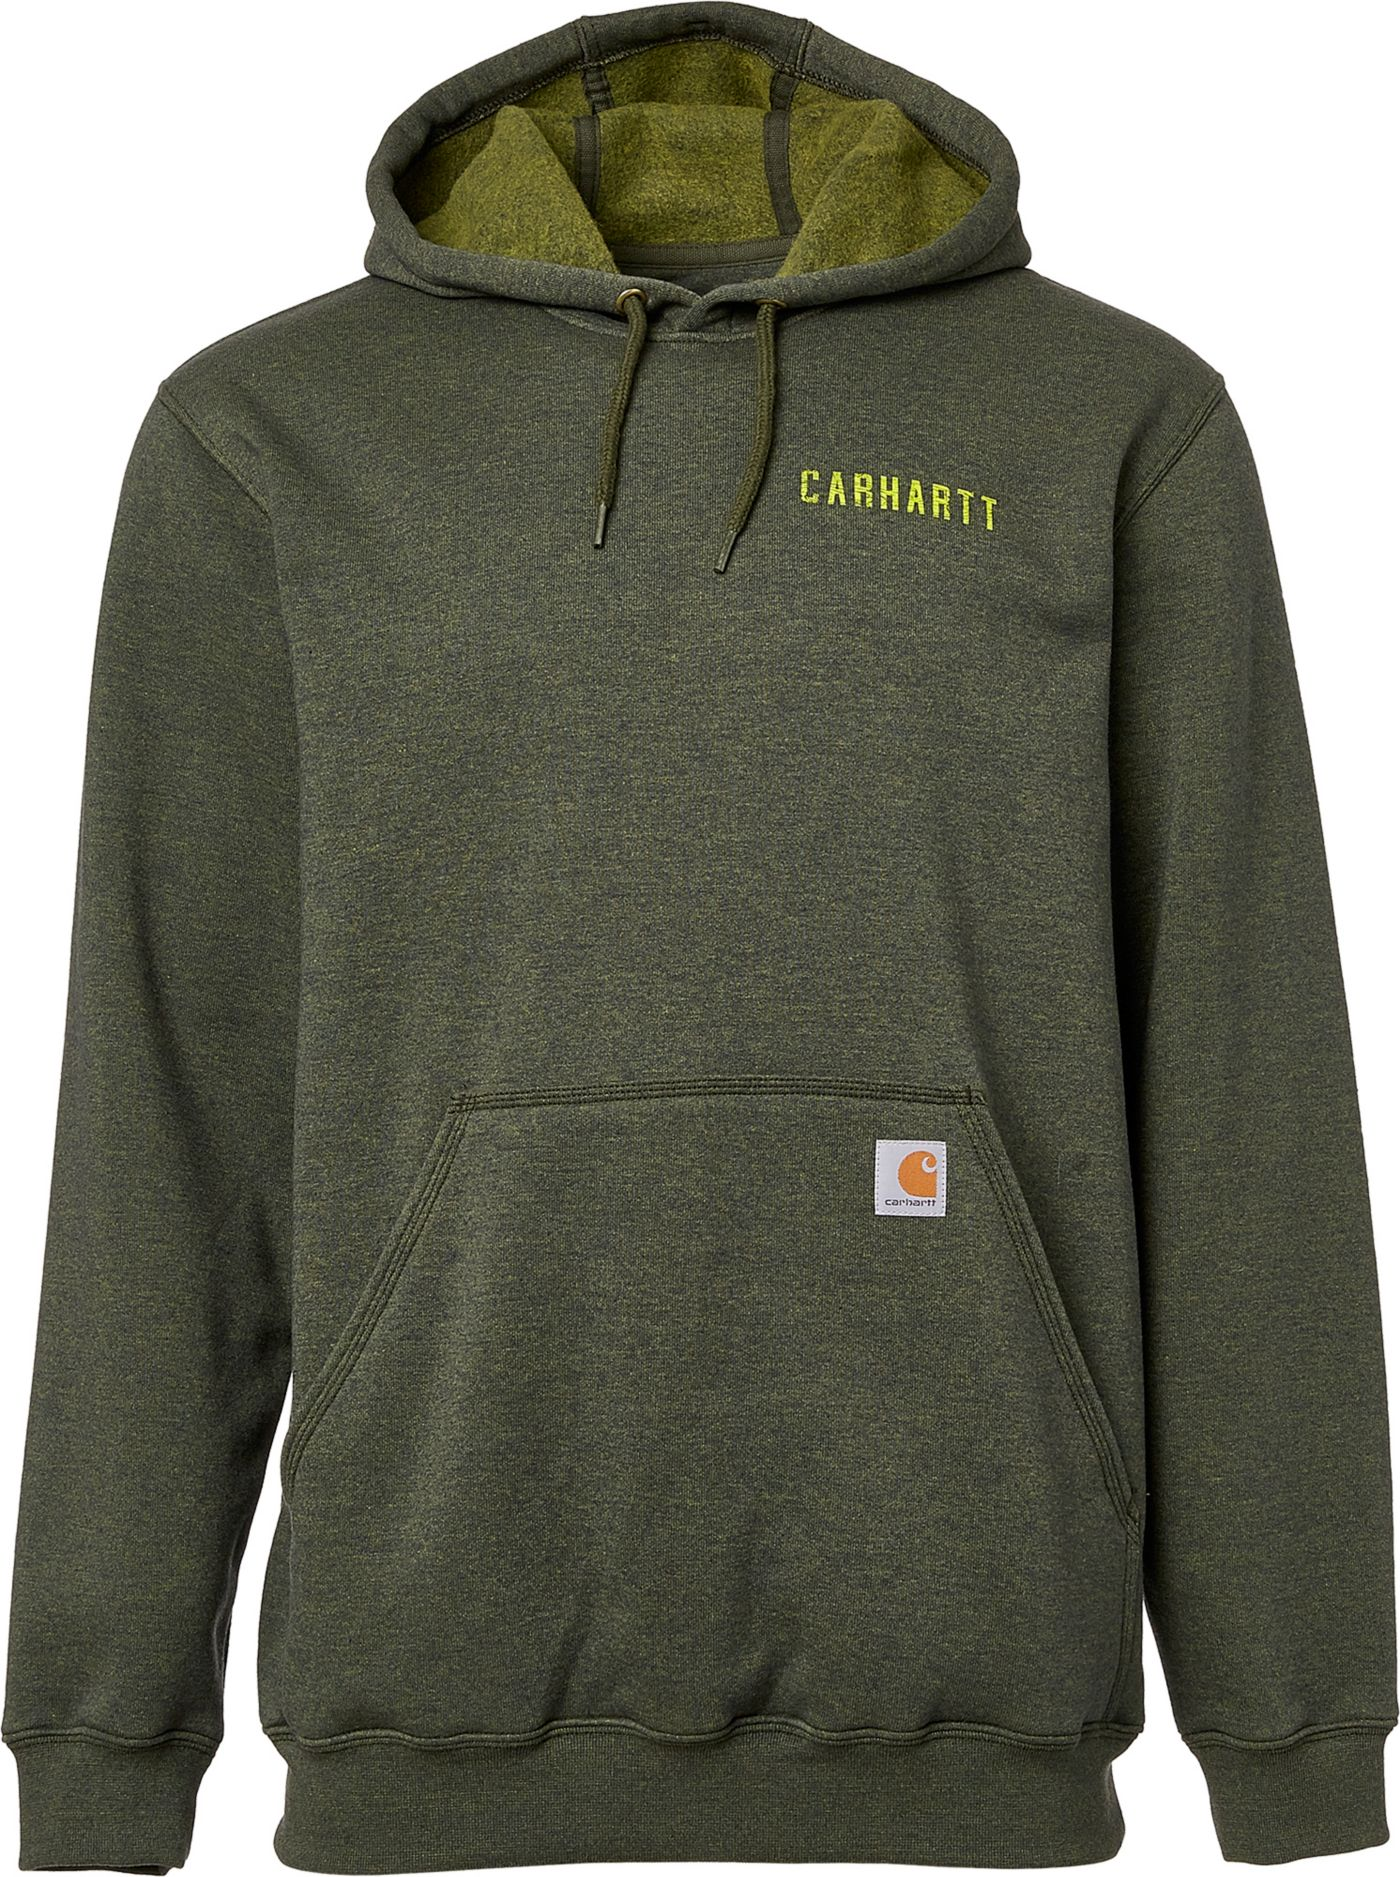 Carhartt Men's Rugged Workwear Graphic Hoodie